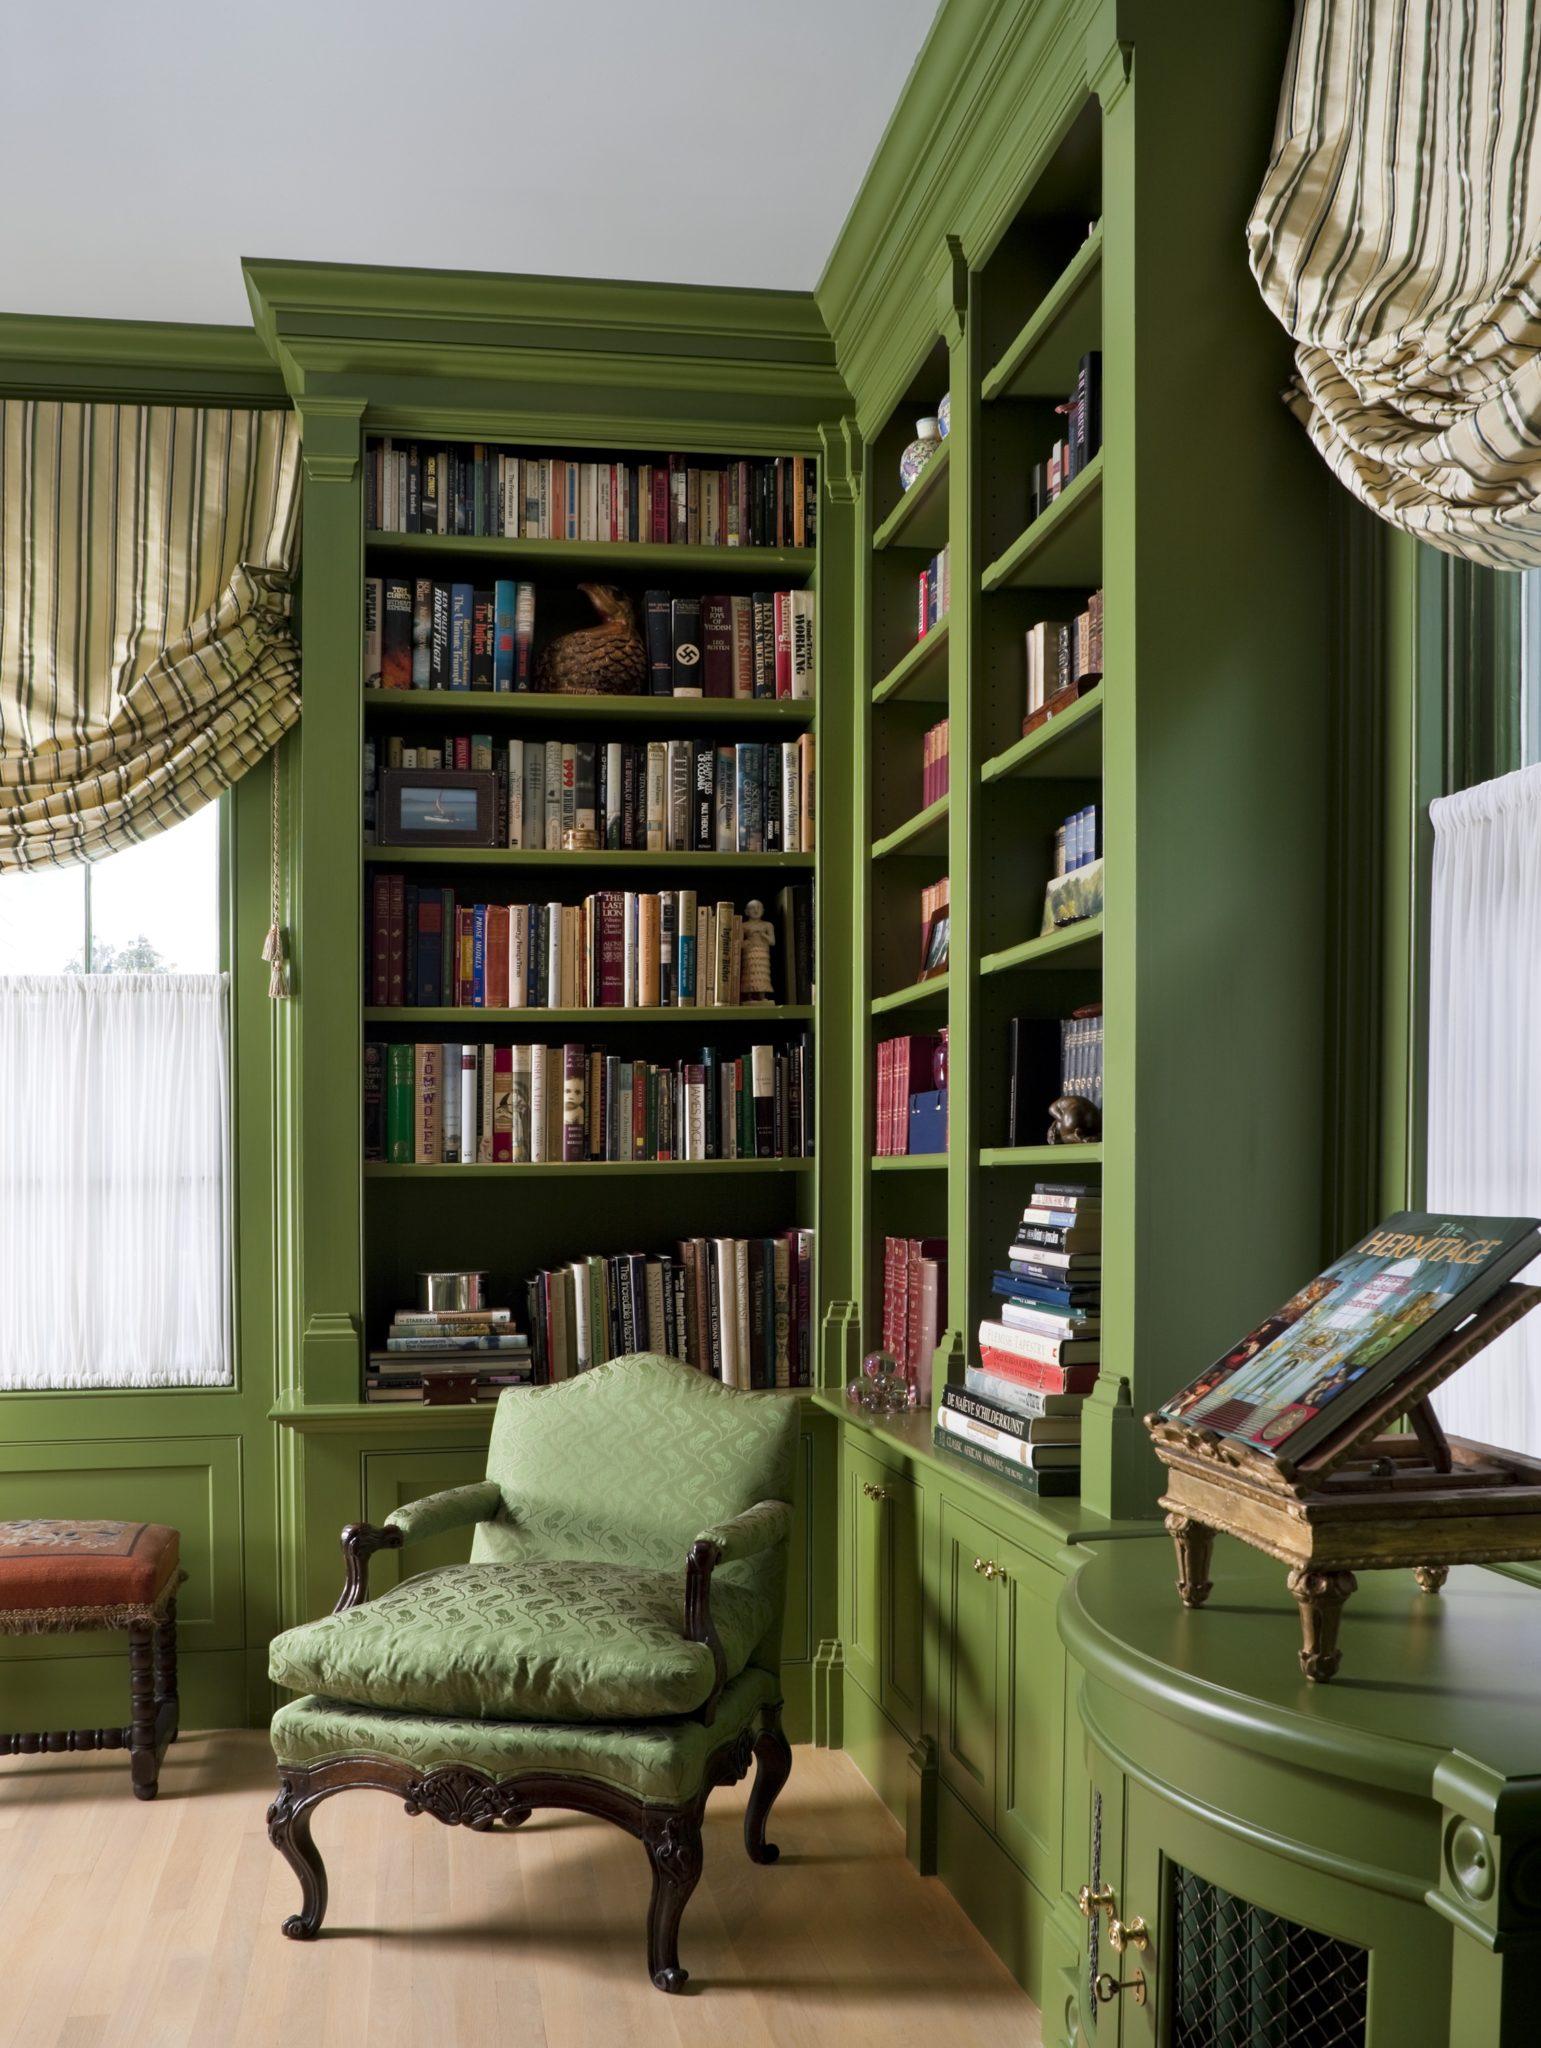 Interior design byCharles Spada Interiors